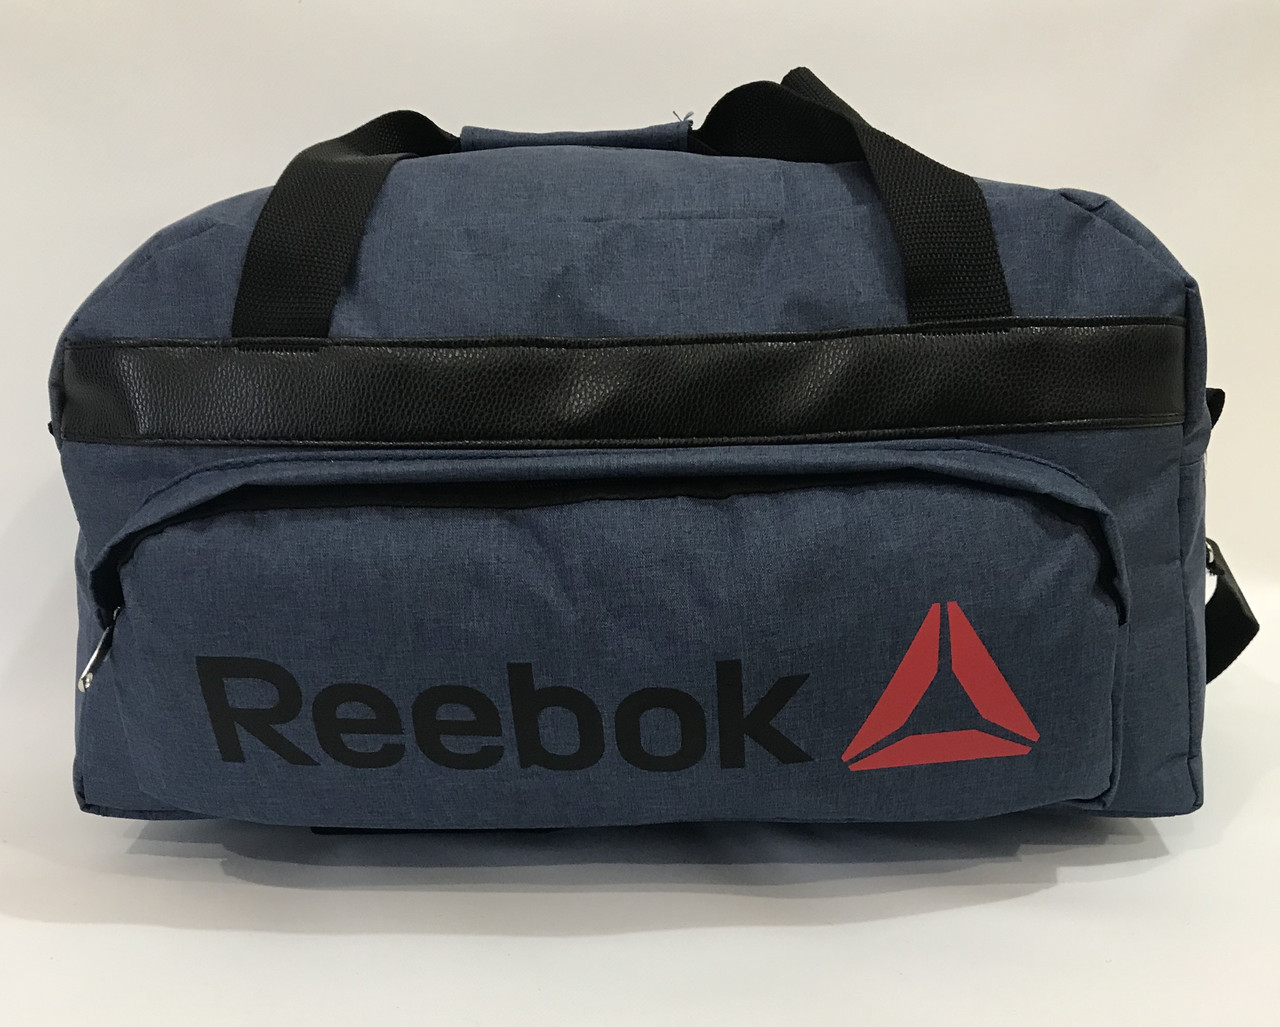 Дорожная сумка D - 15 - 98 Reebok